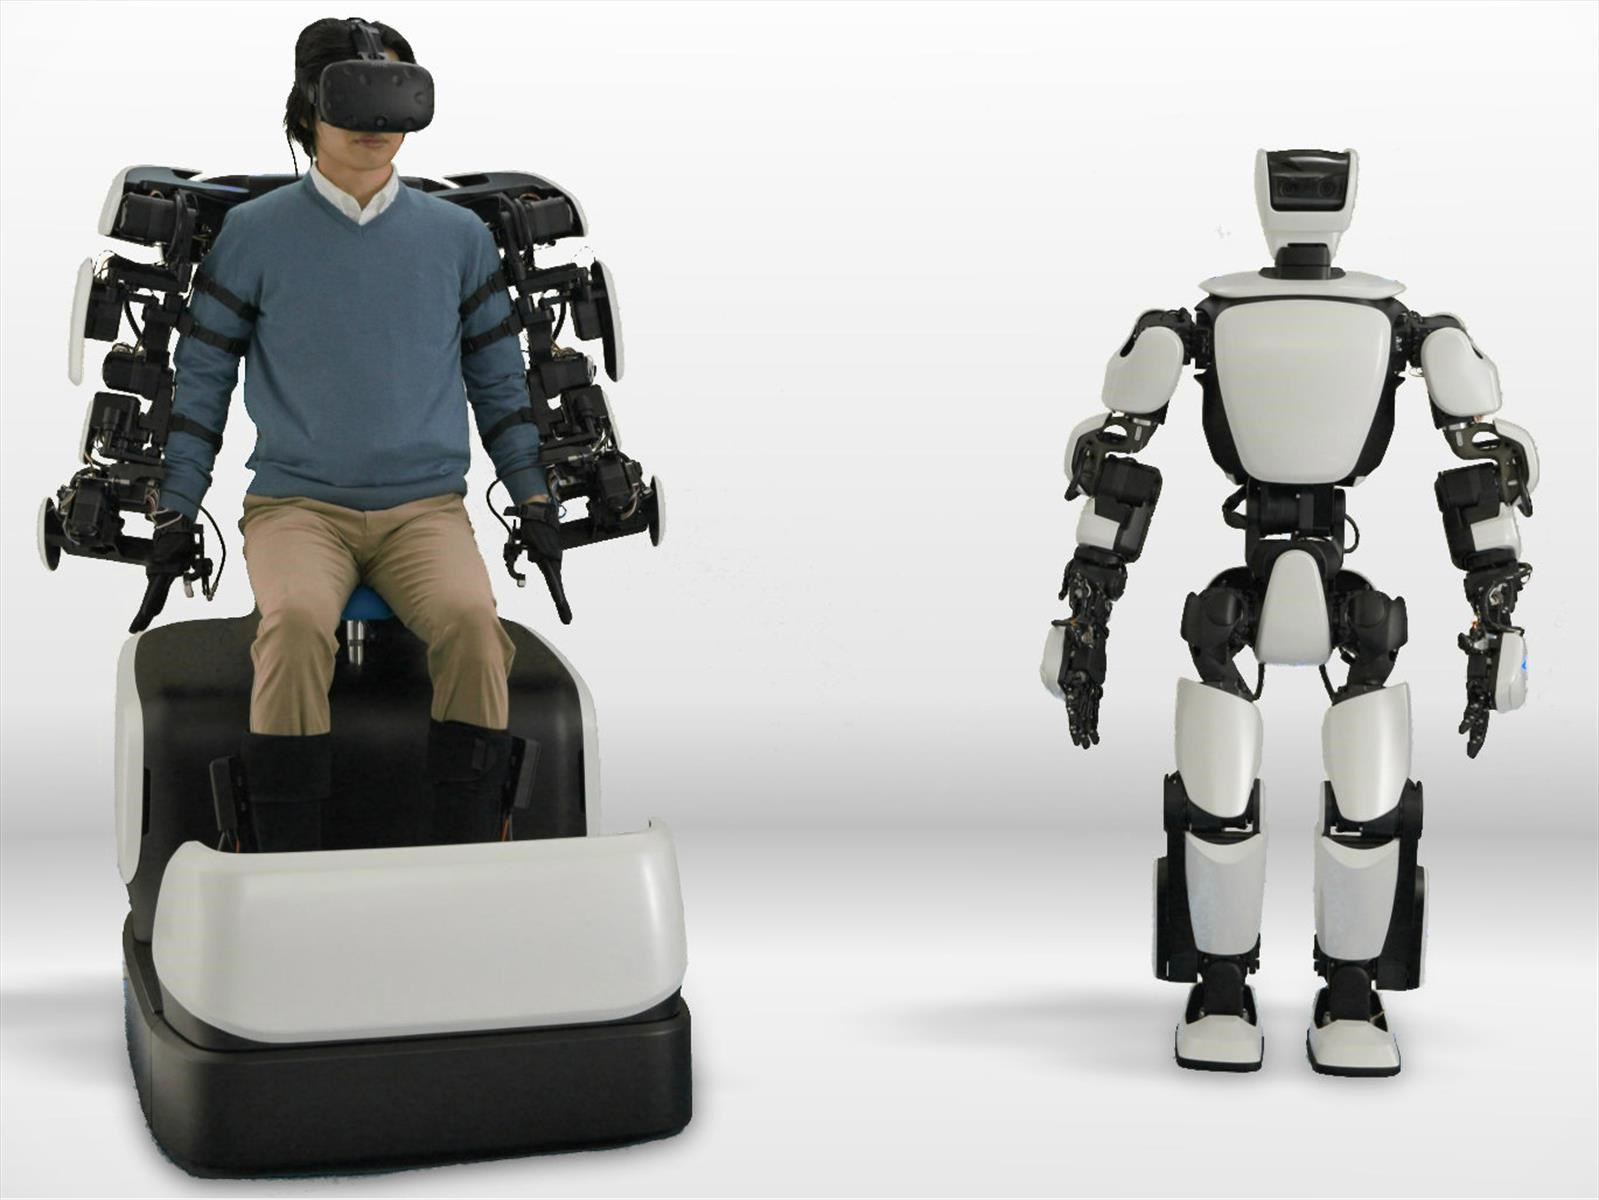 Toyota T-HR3 es un innovador robot humanoide